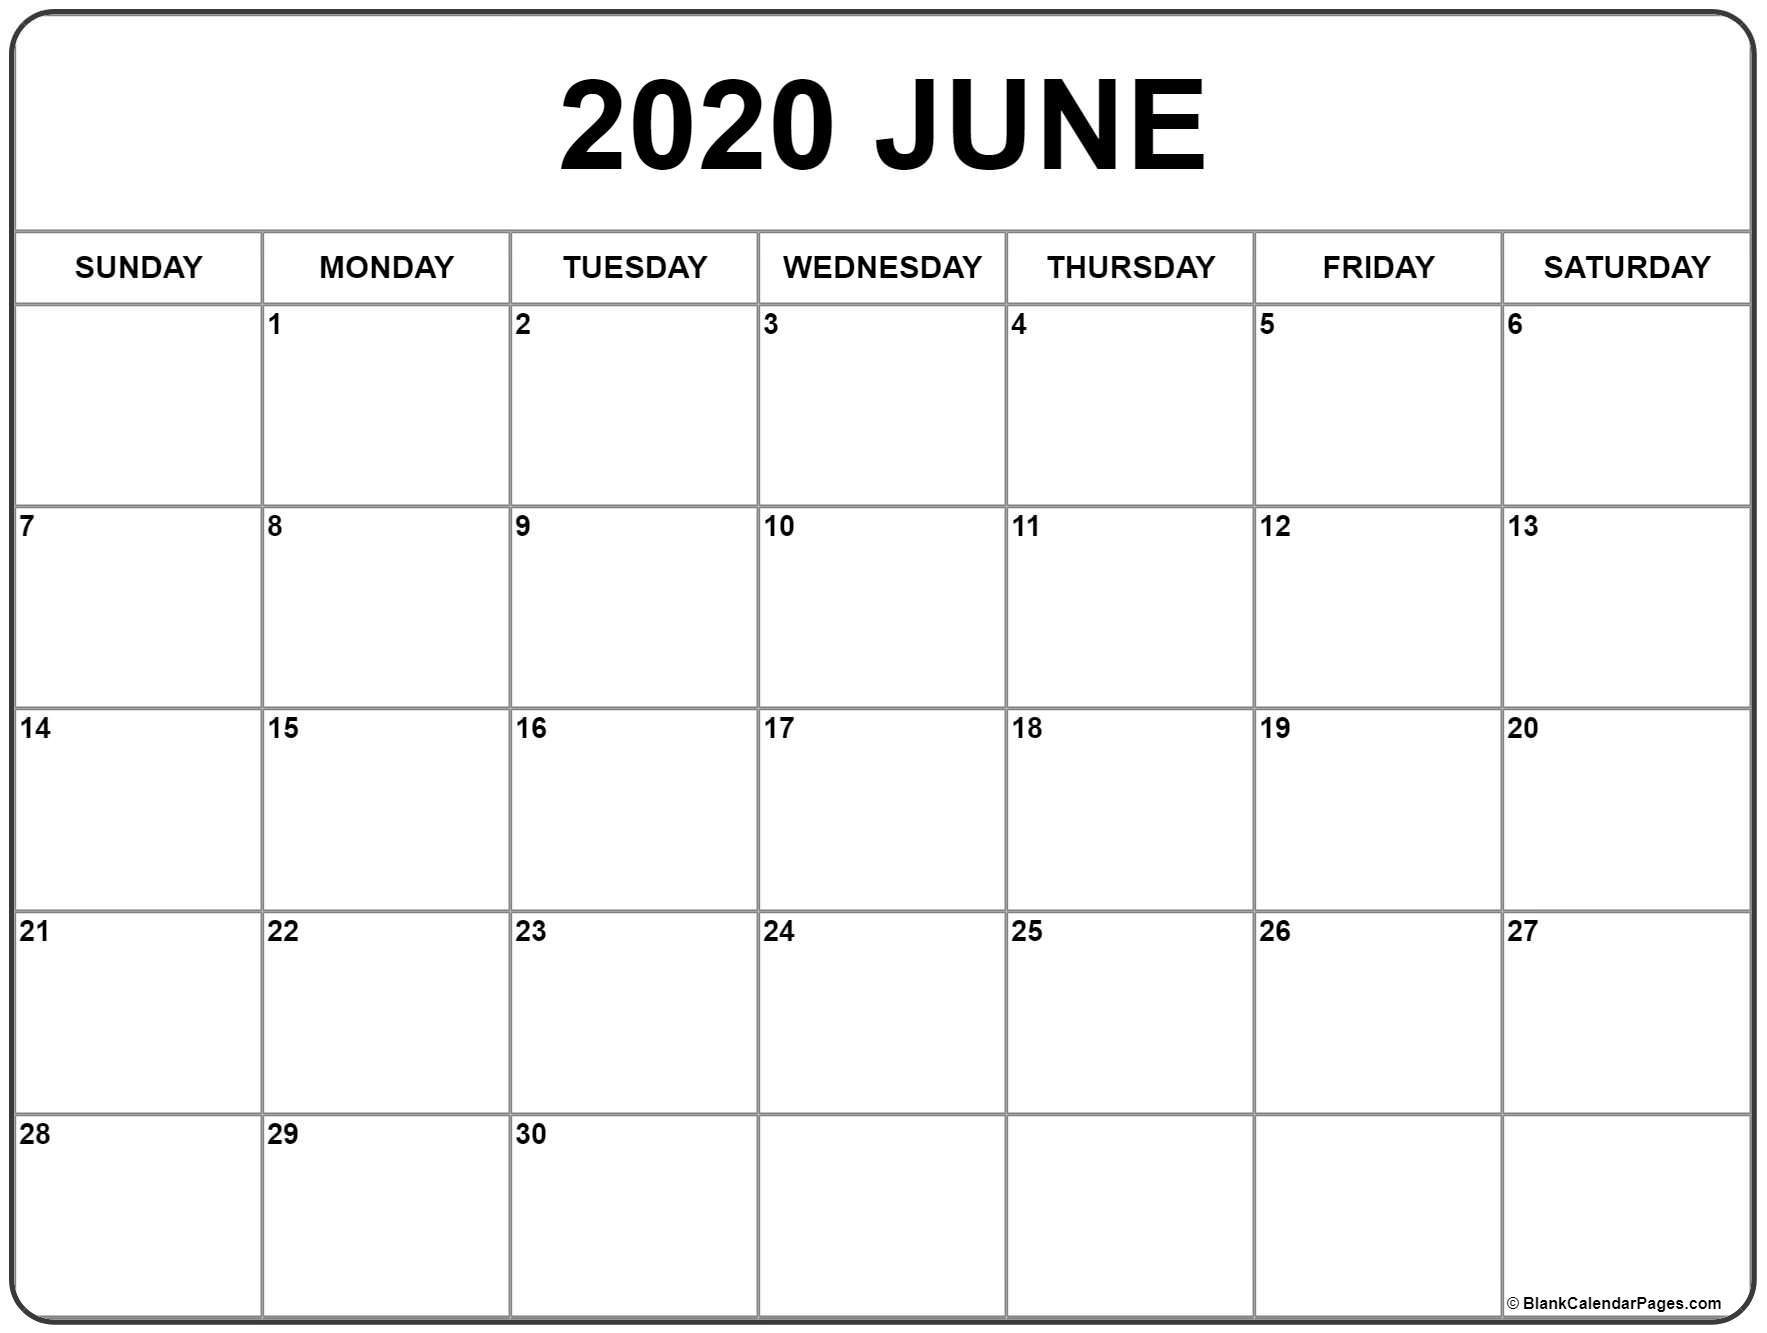 June Calendar Printable 2020 - Wpa.wpart.co